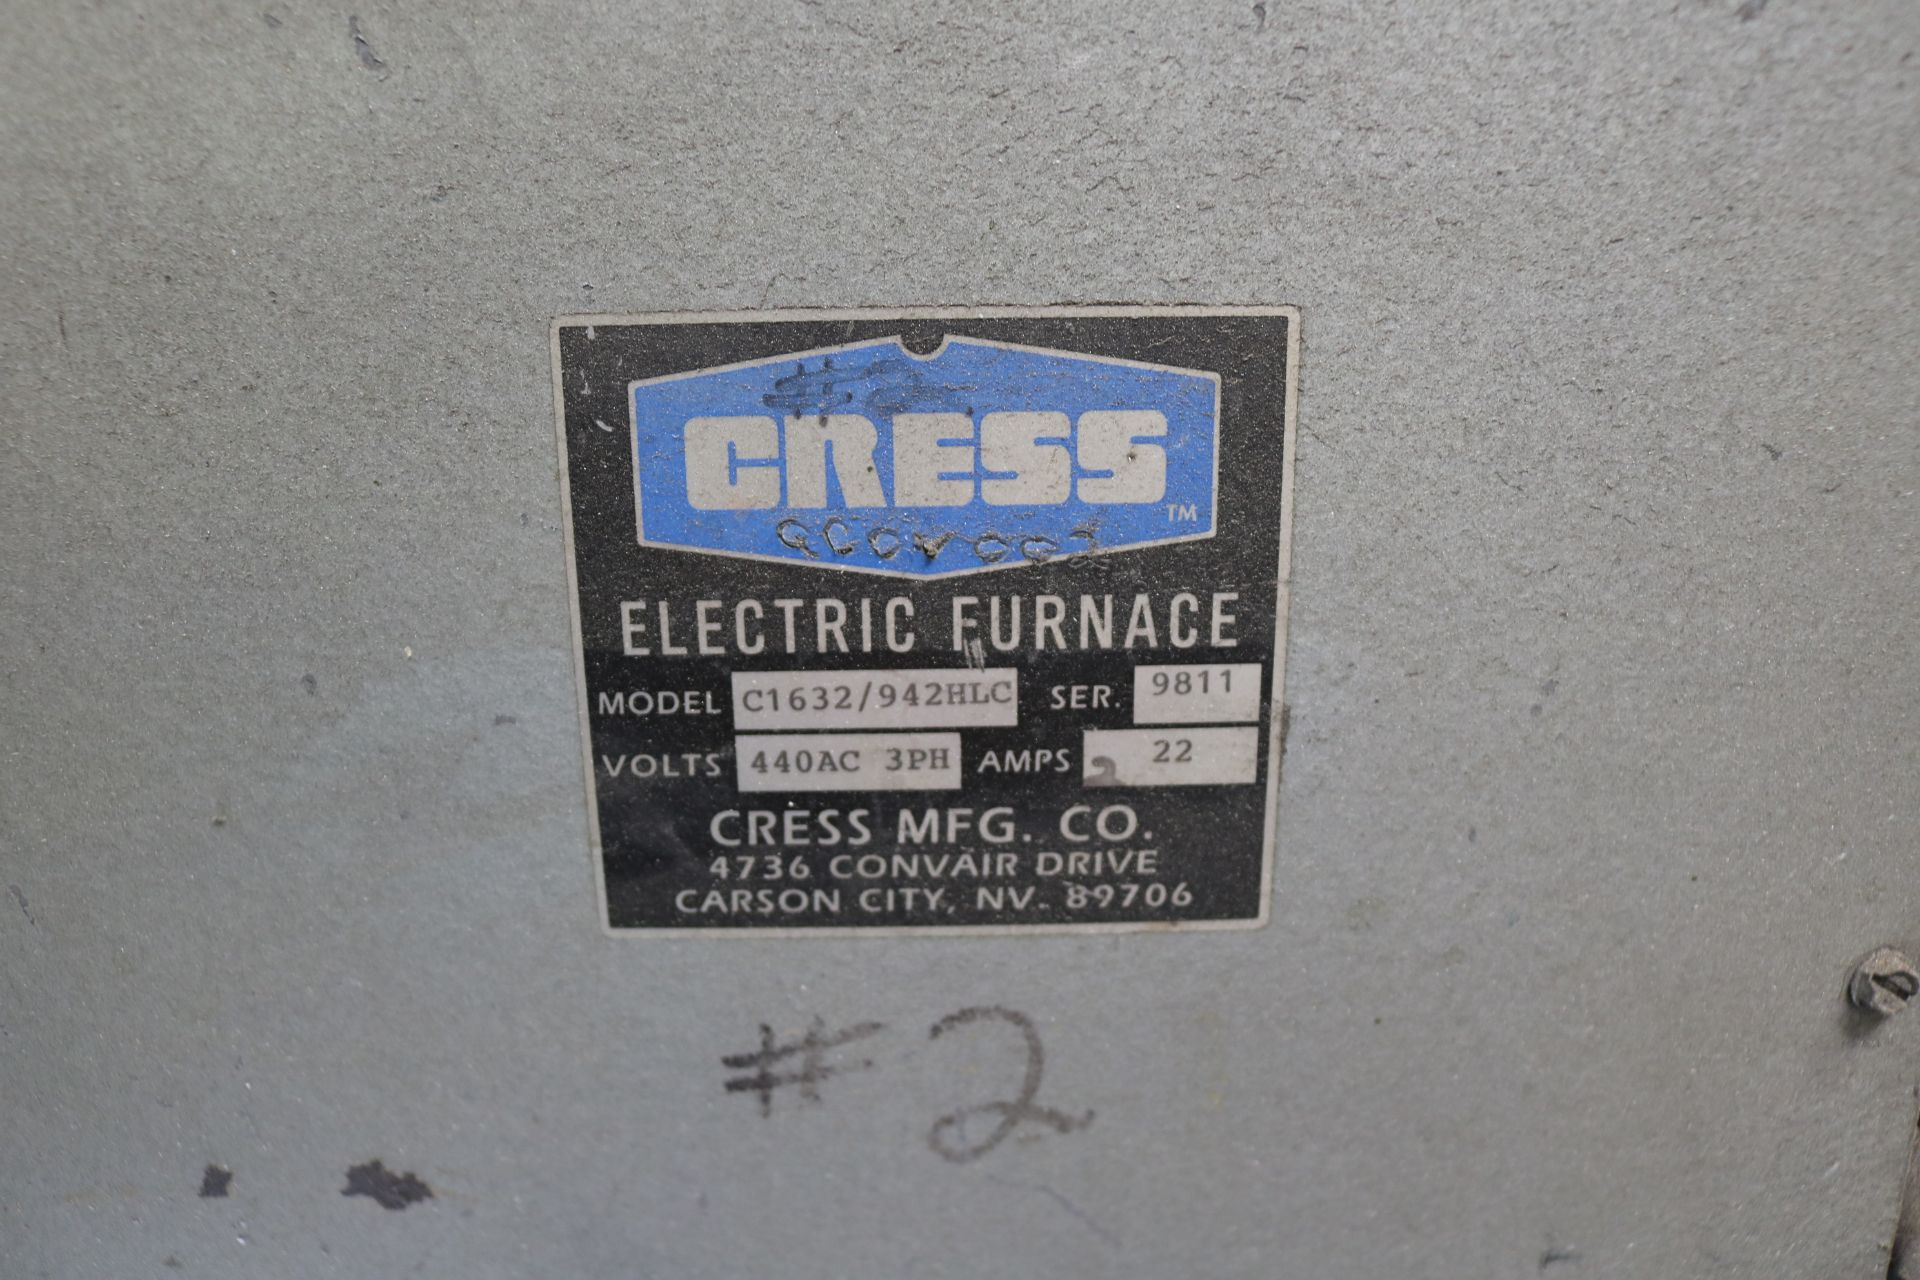 Lot 28 - CRESS ELECTRIC FURNACE, MODEL C1632/942 HLC, S/N 9811